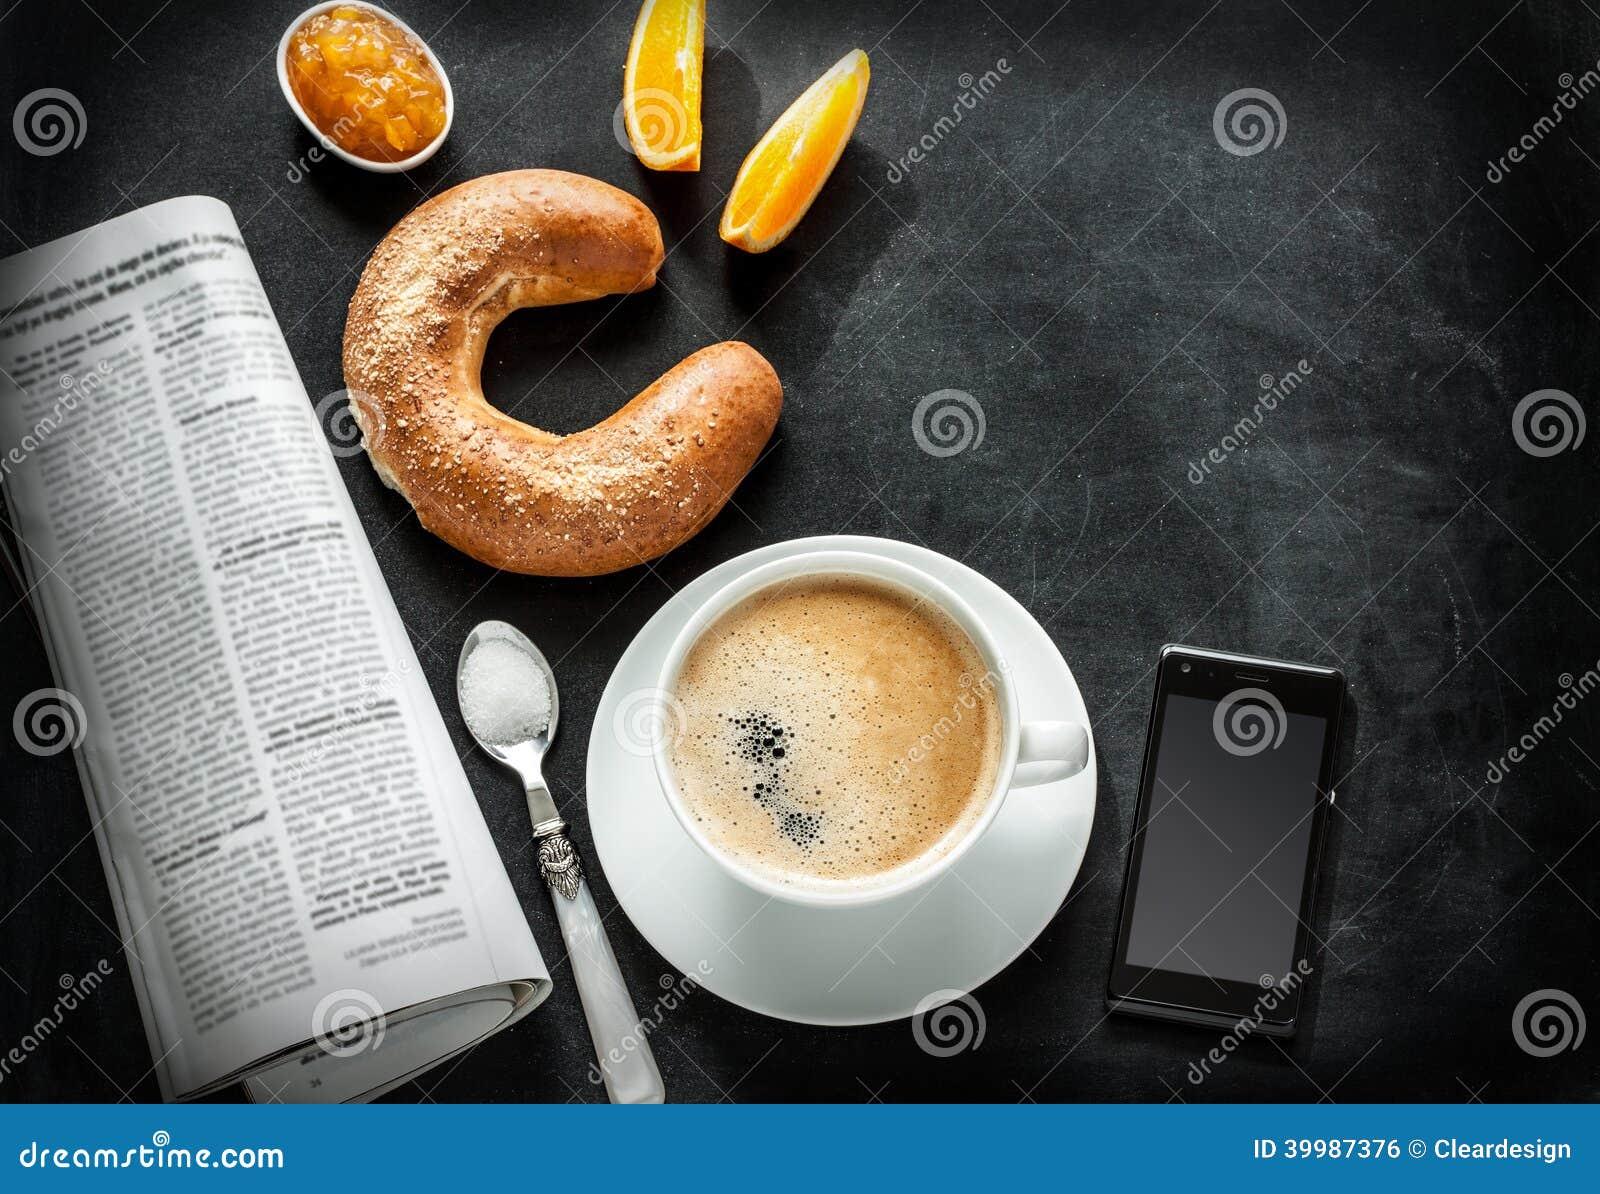 Continentaal ontbijt en mobiele telefoon op zwart bord